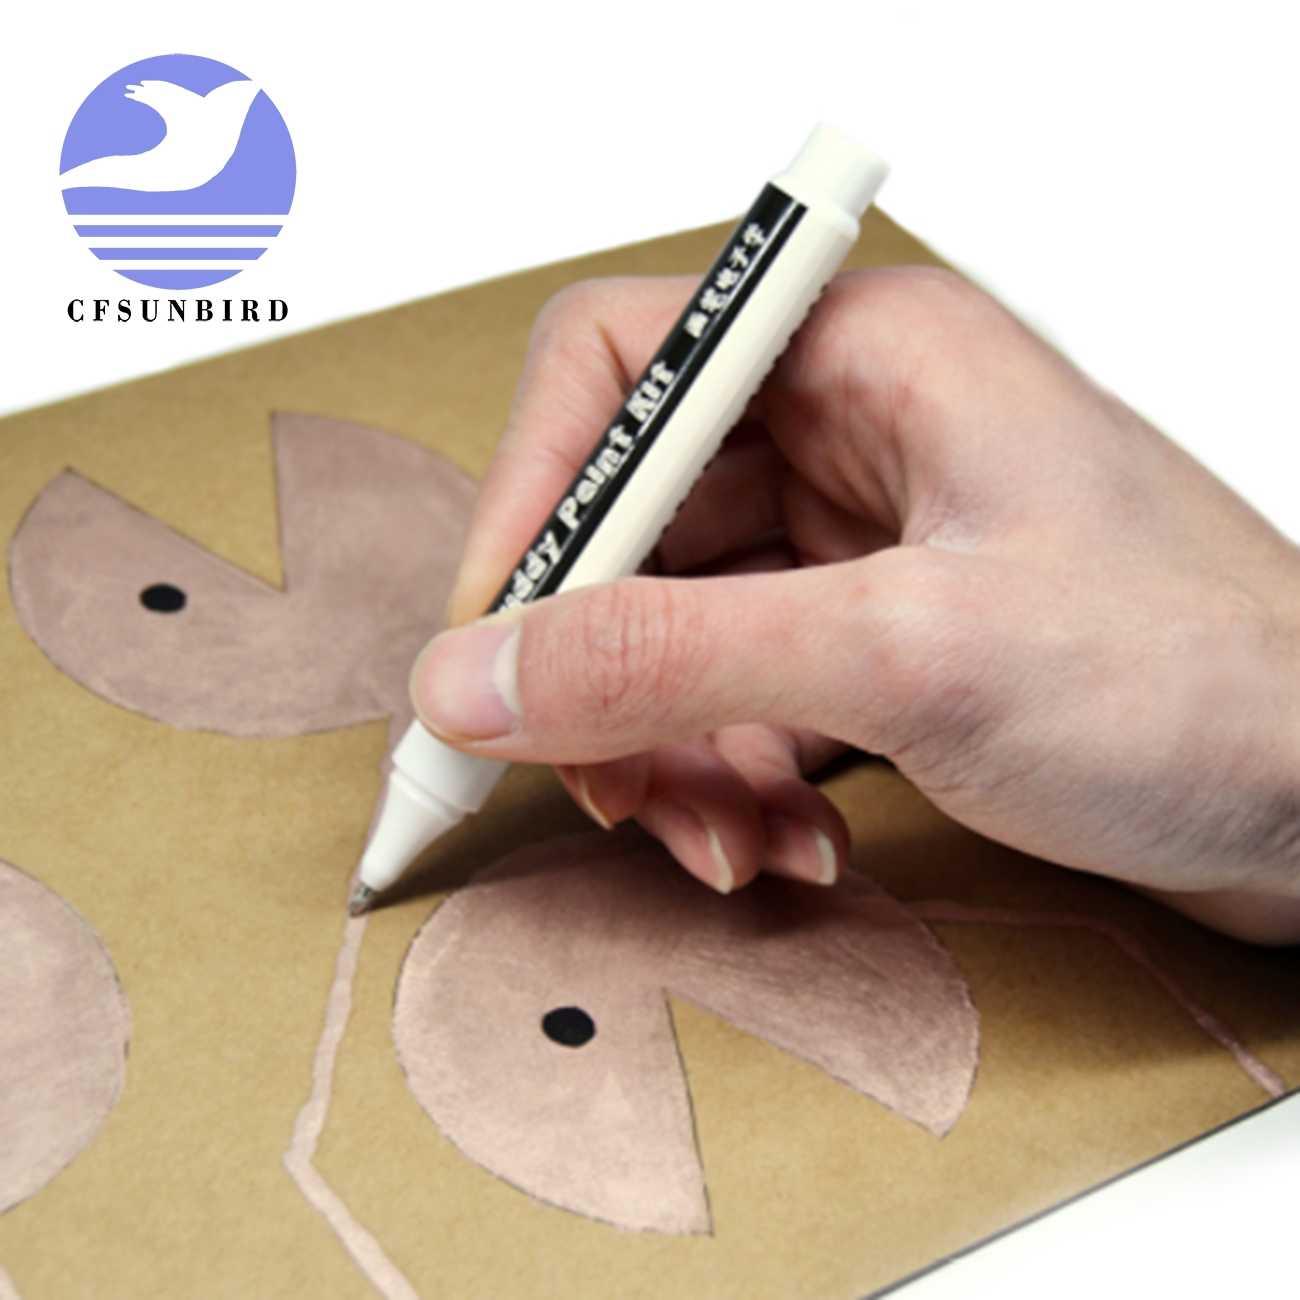 CFsunbird 導電性インクペン電子回路描画瞬時に魔法回路 DIY メーカー学生子供教育黒/ゴールド